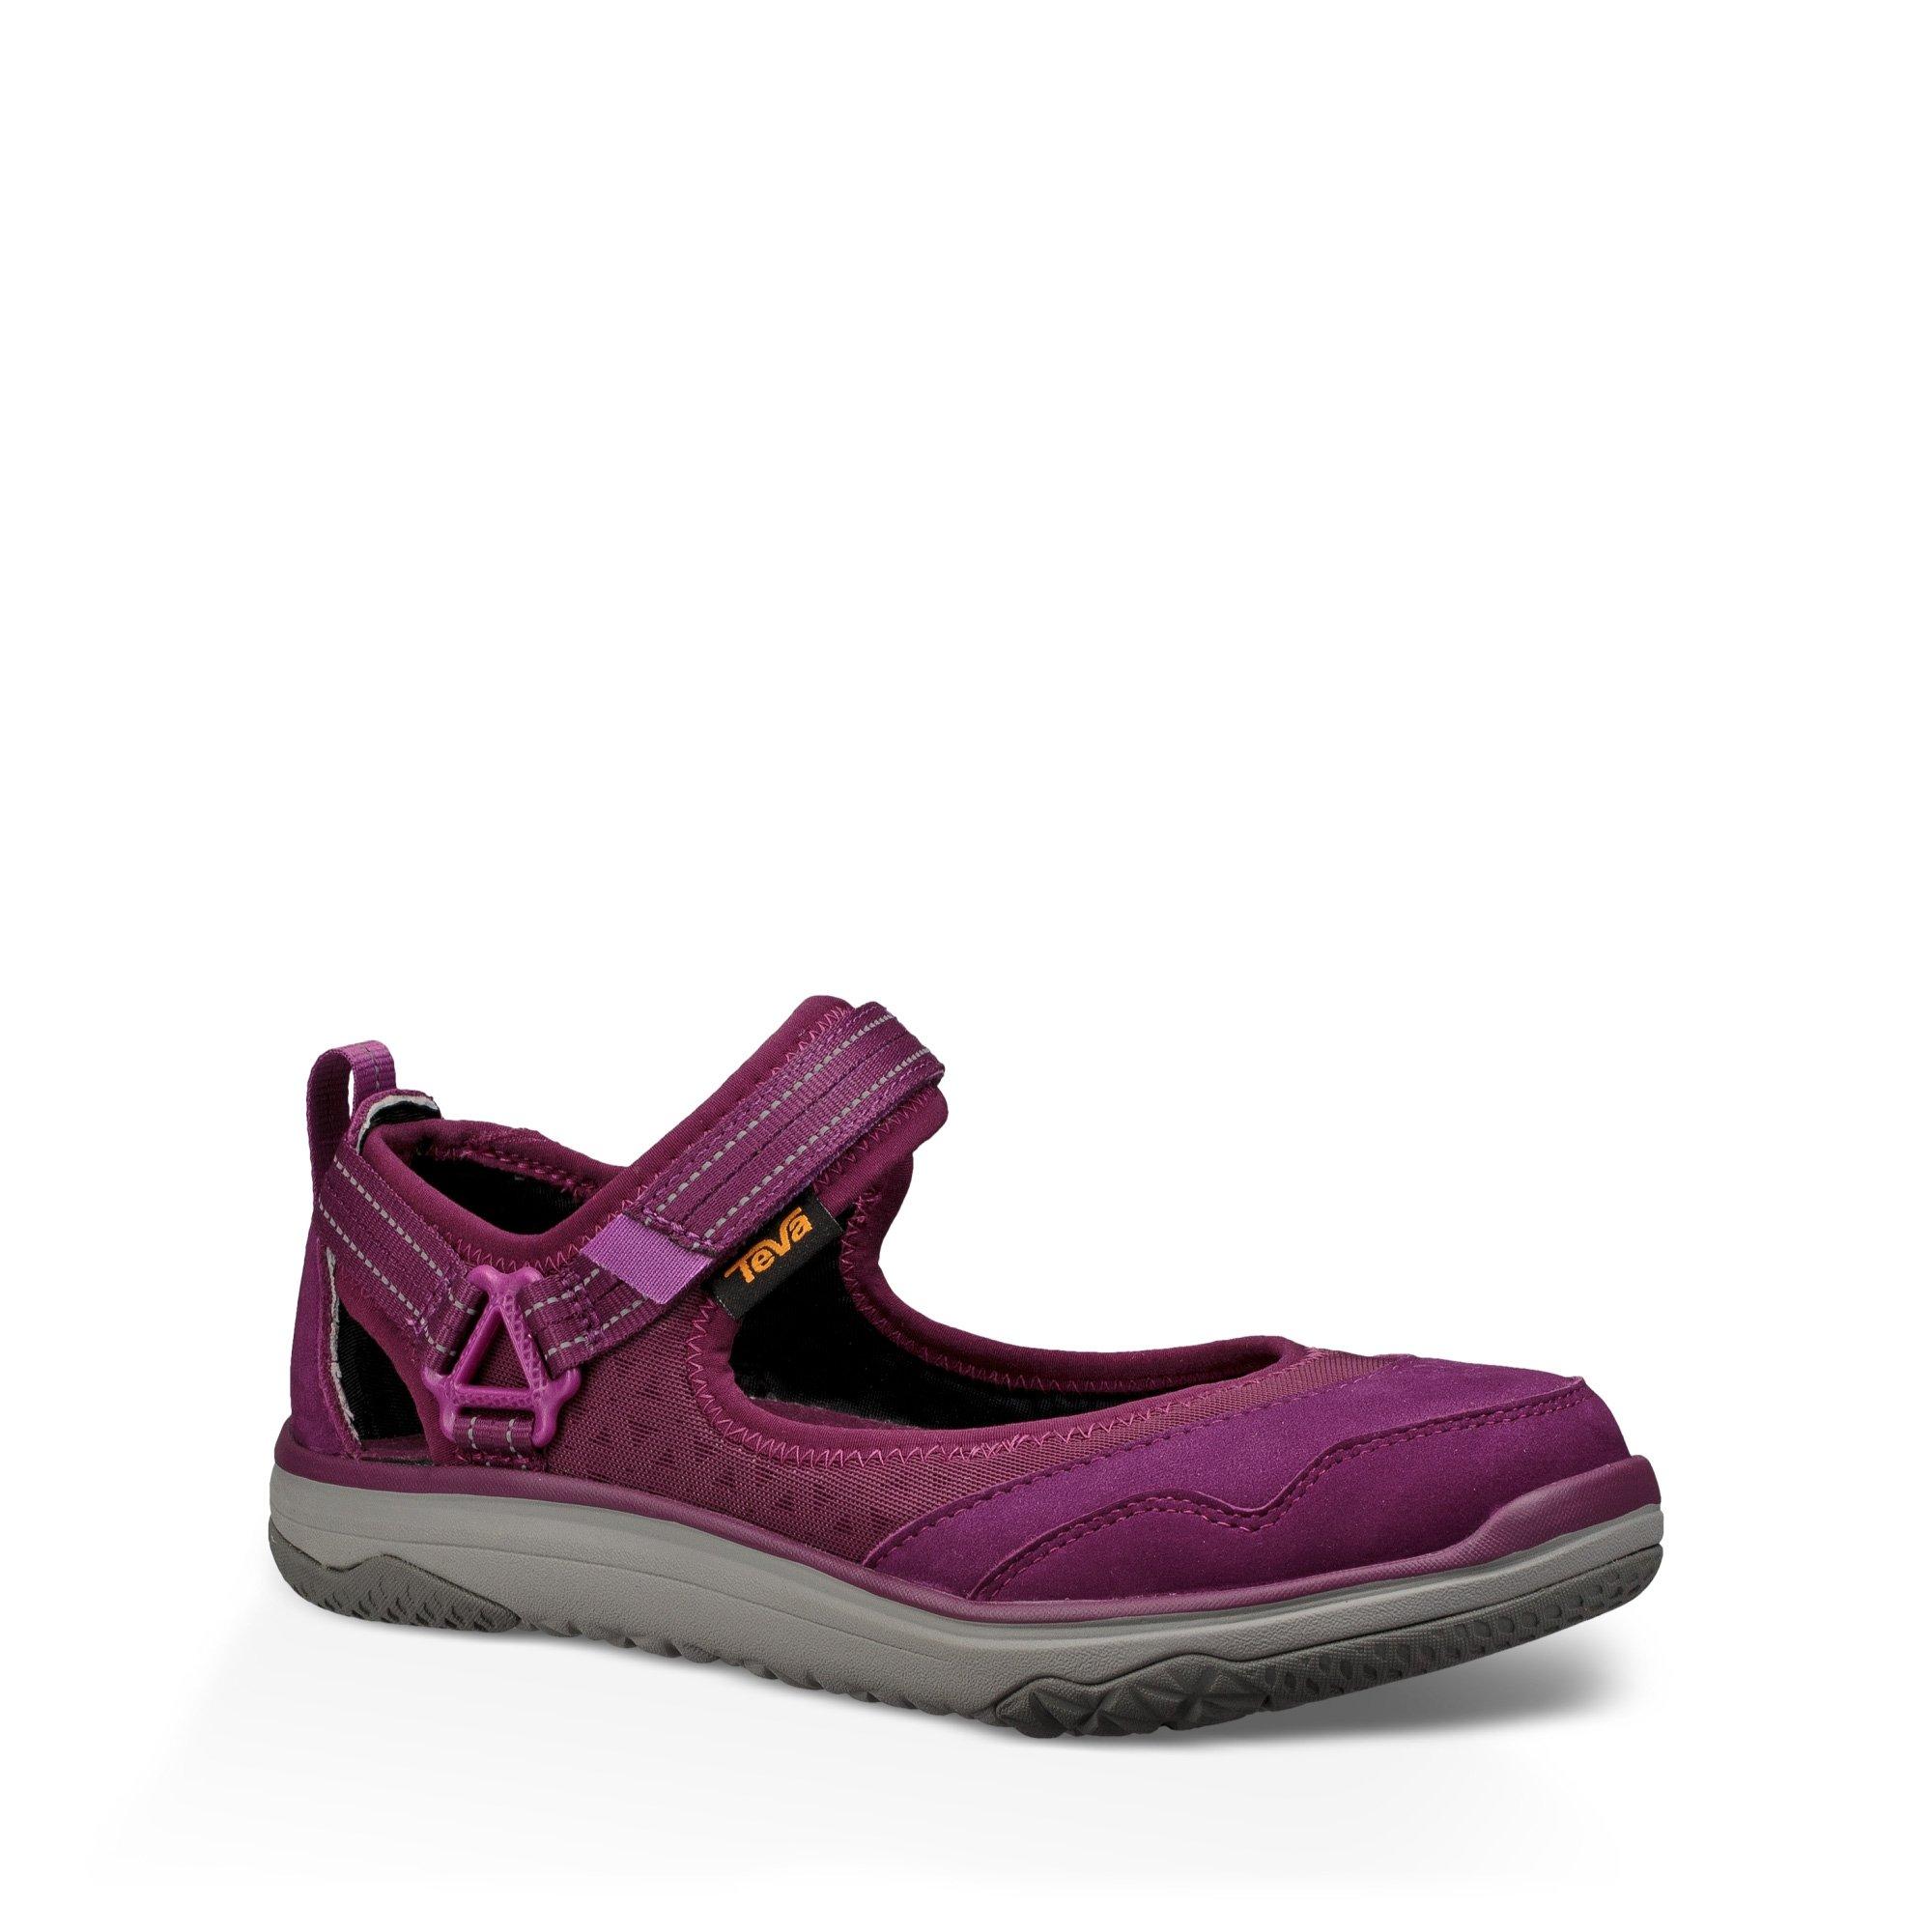 Teva TerraFloat Travel MJ Sandal Women's Hiking 8 Dark Purple